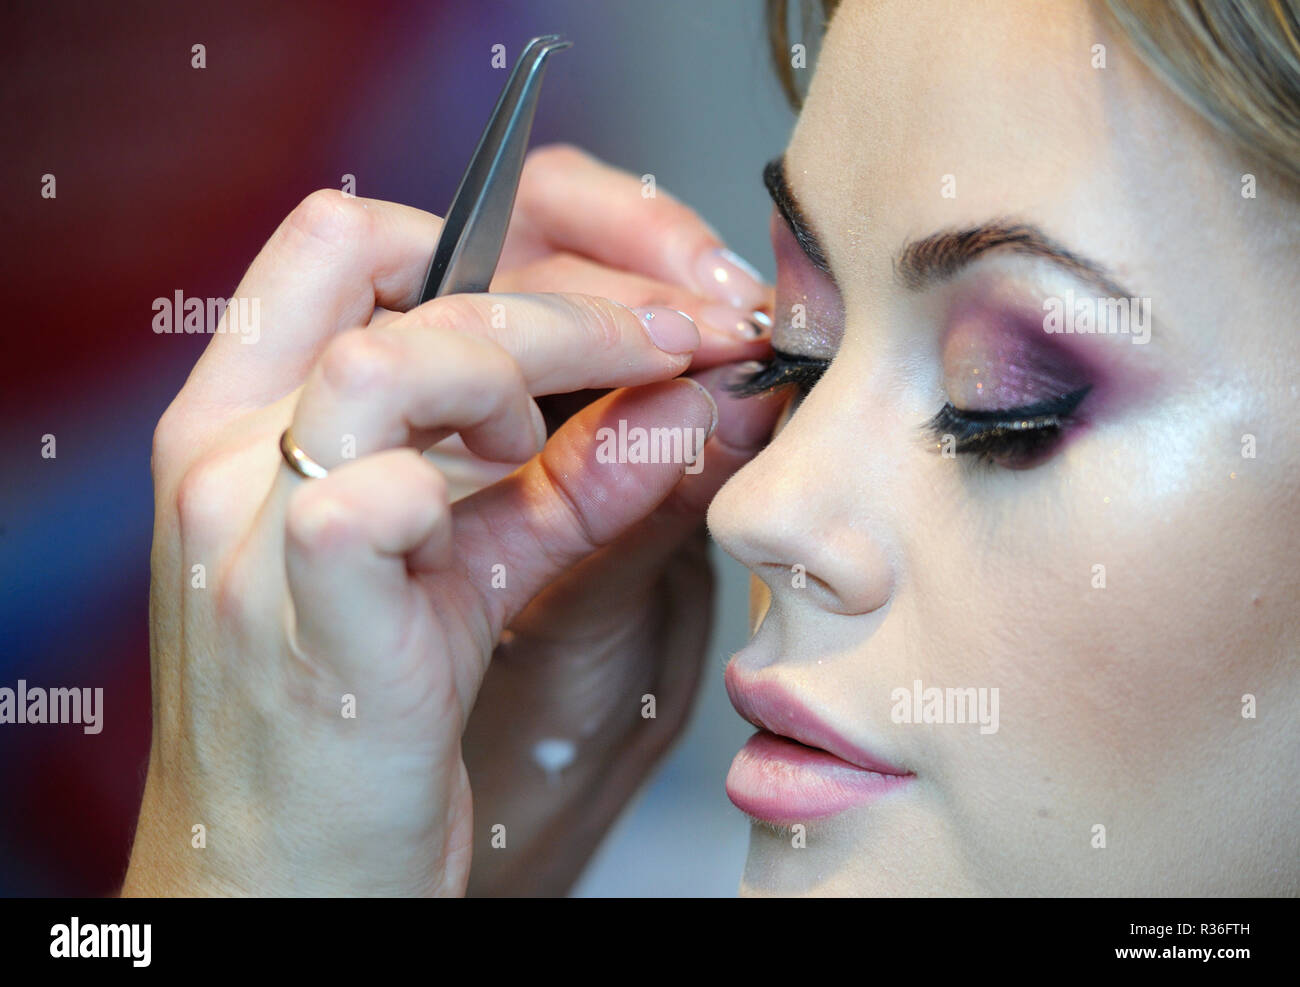 47bdae152a0 At a beauty salon. Make-up artist's fingers fixing false eyelashes on a  female